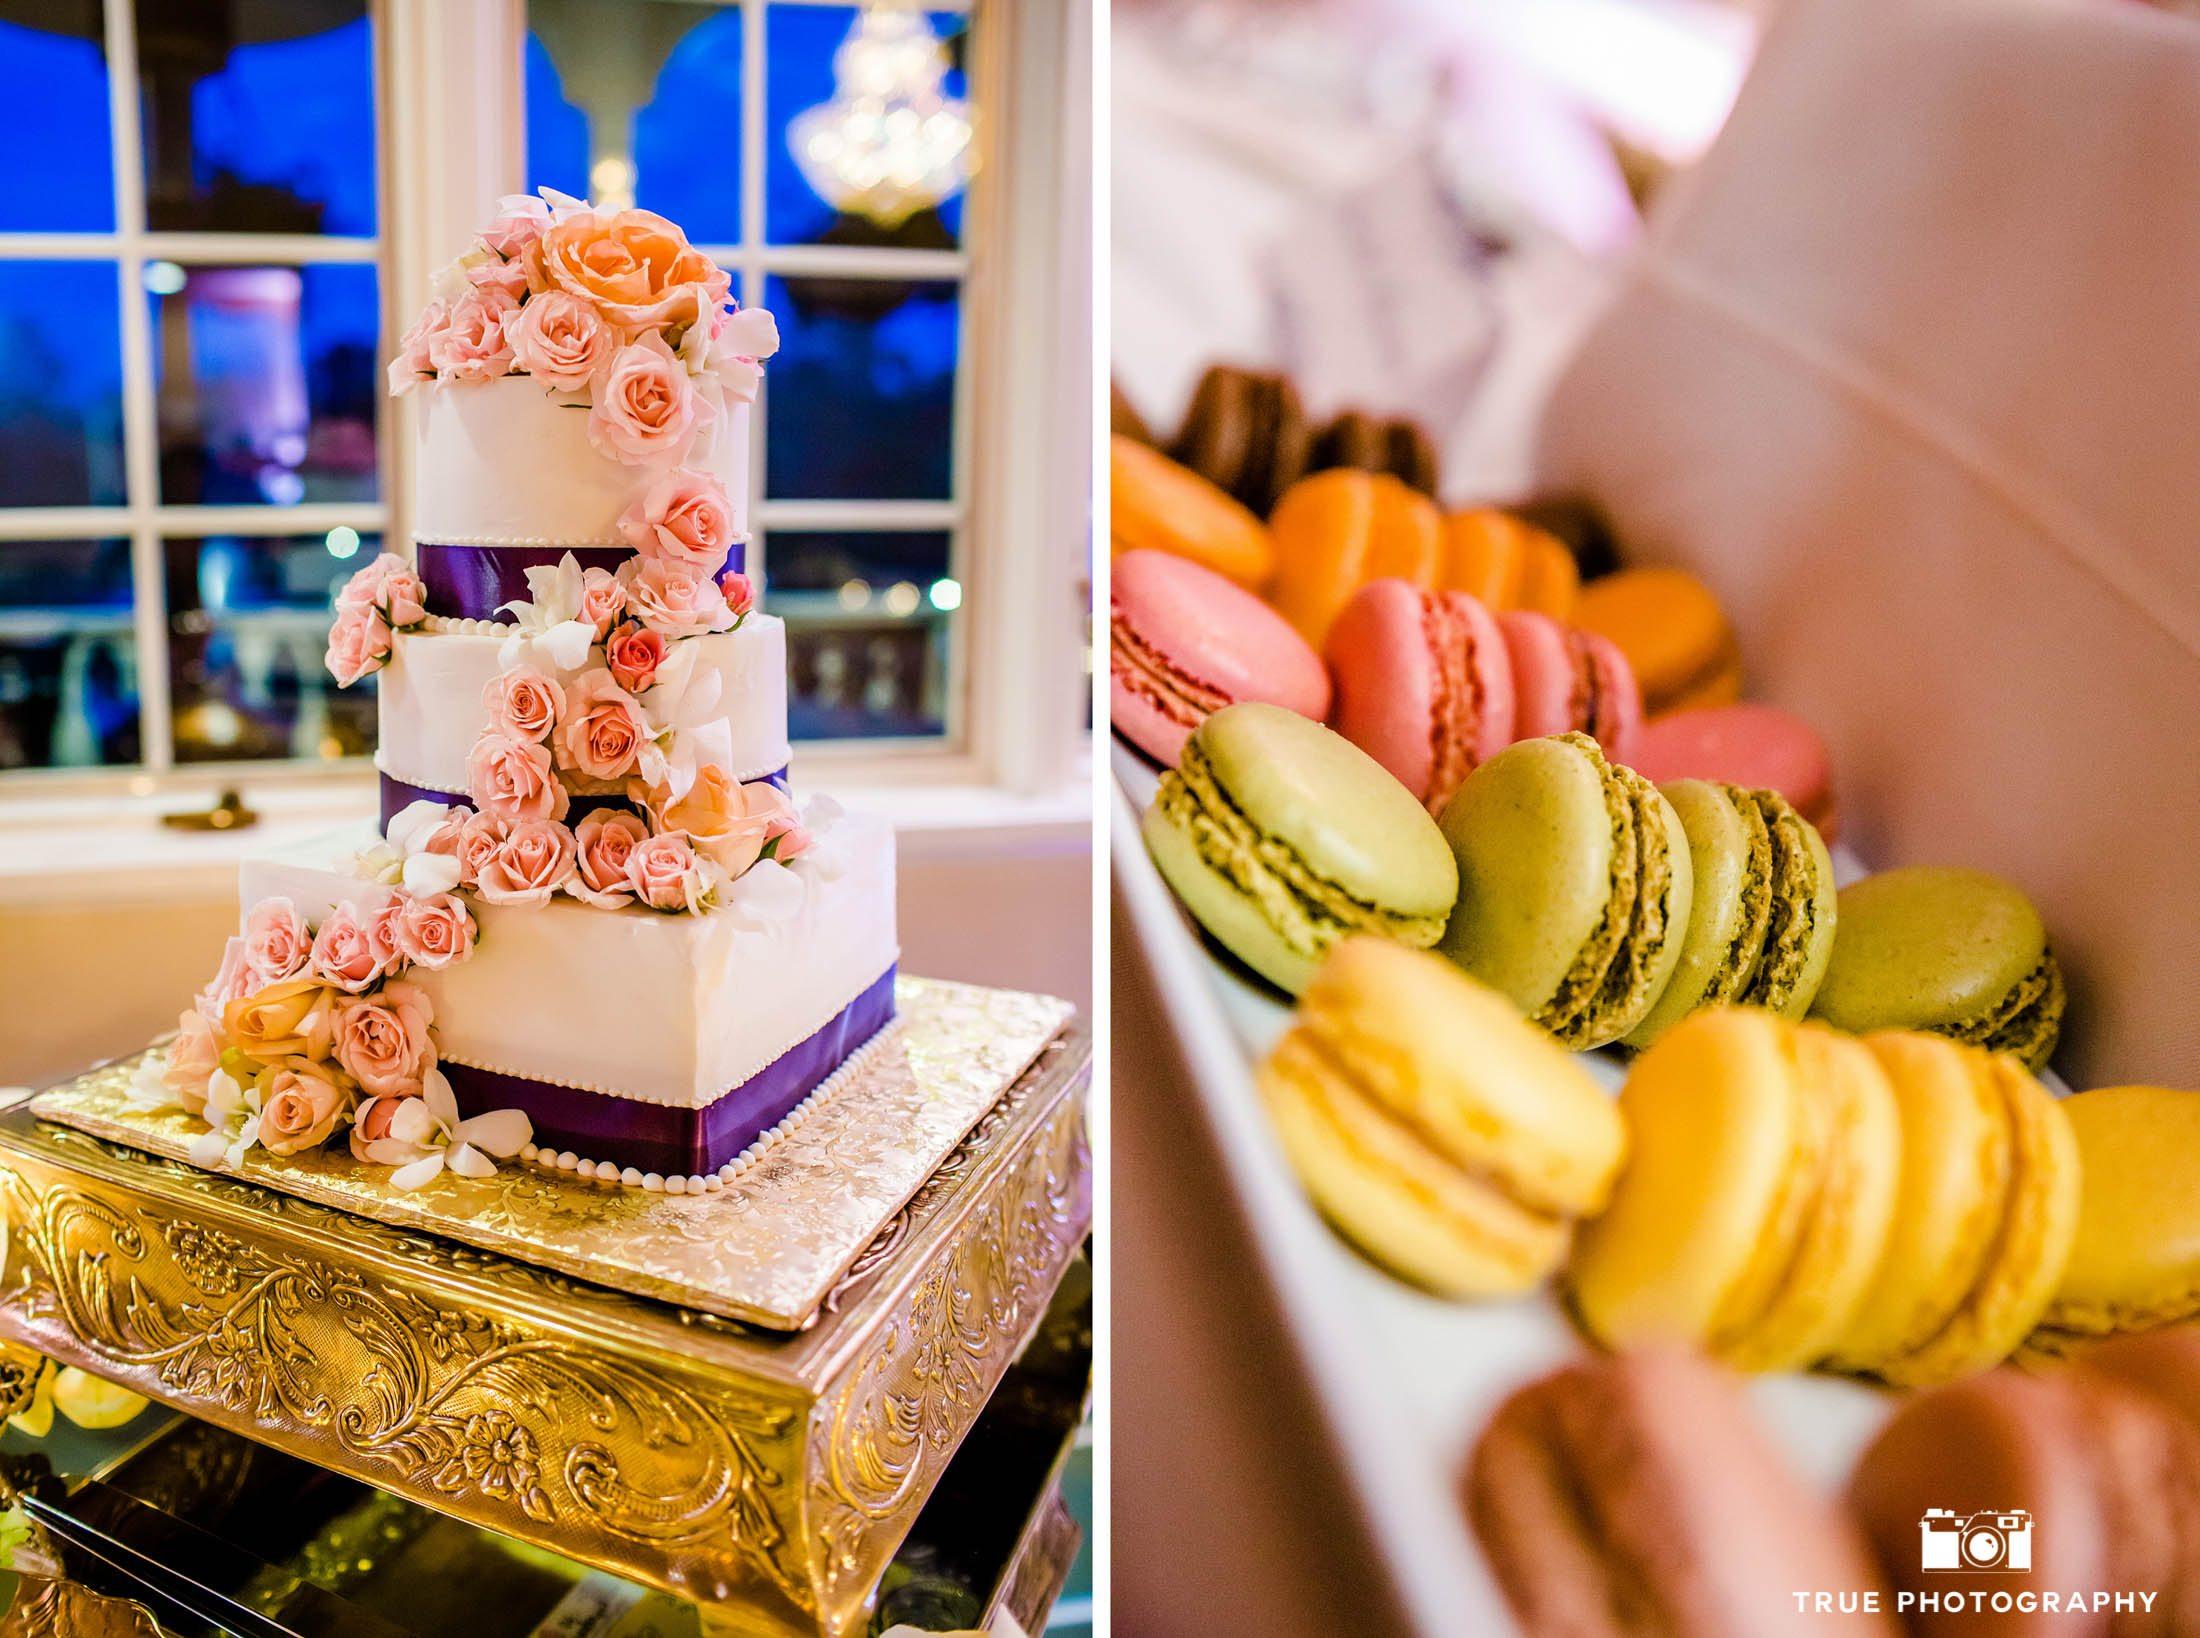 Macarons for the Wedding Dessert Table